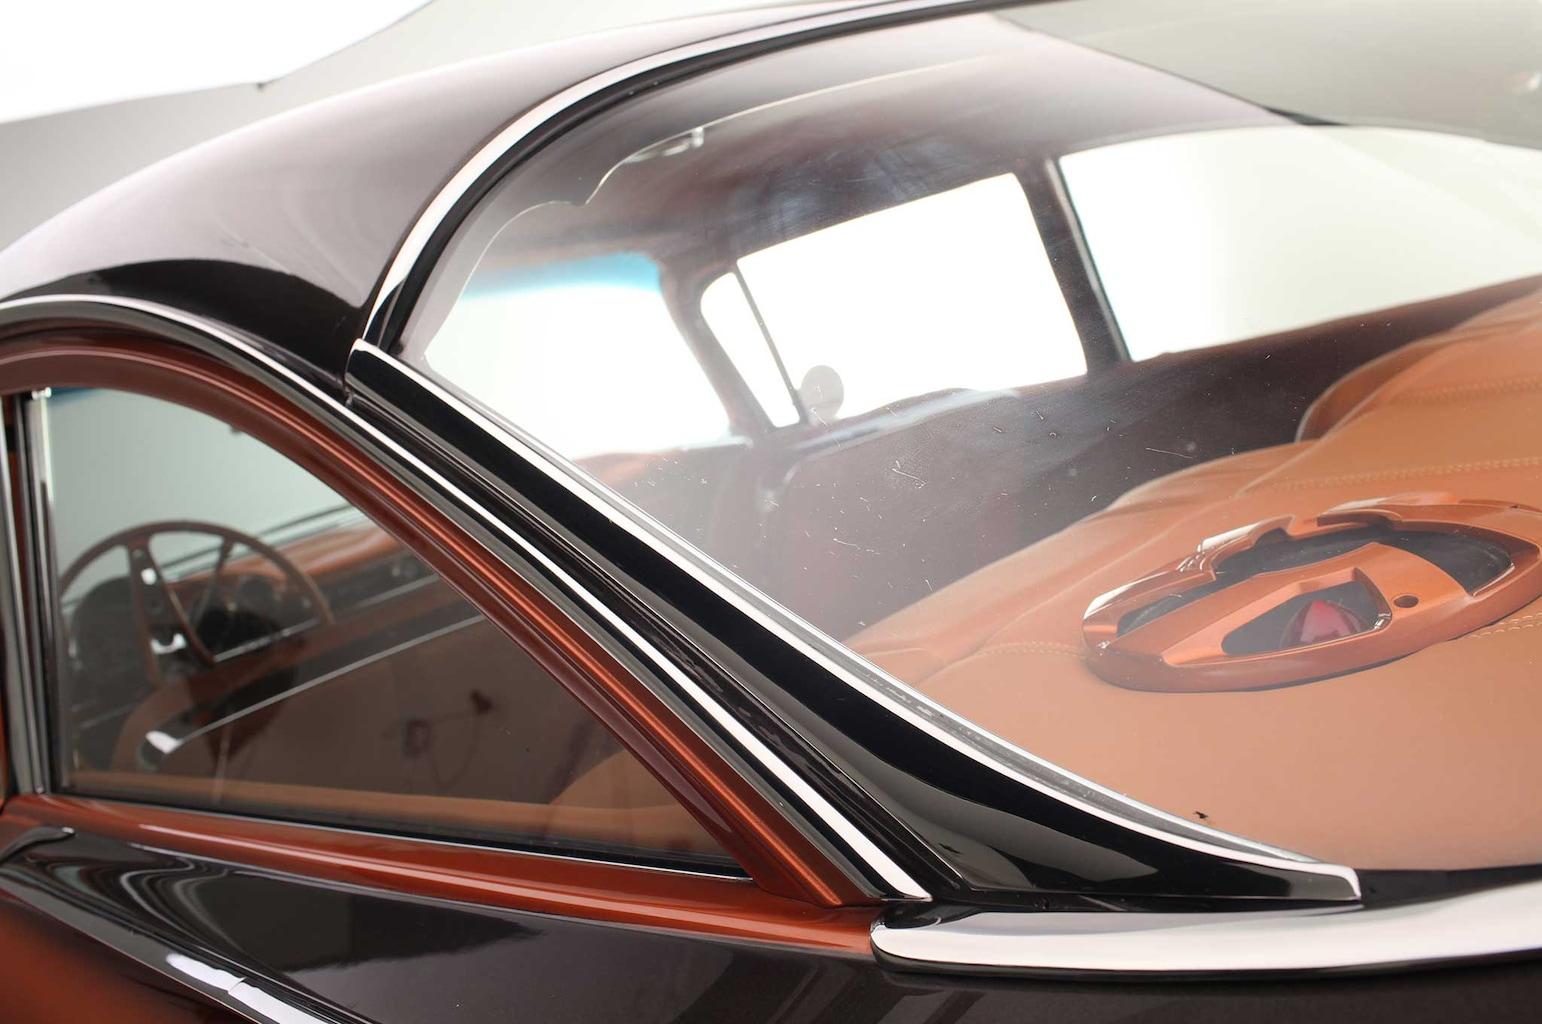 1959 chevrolet bel air rear window trim 013